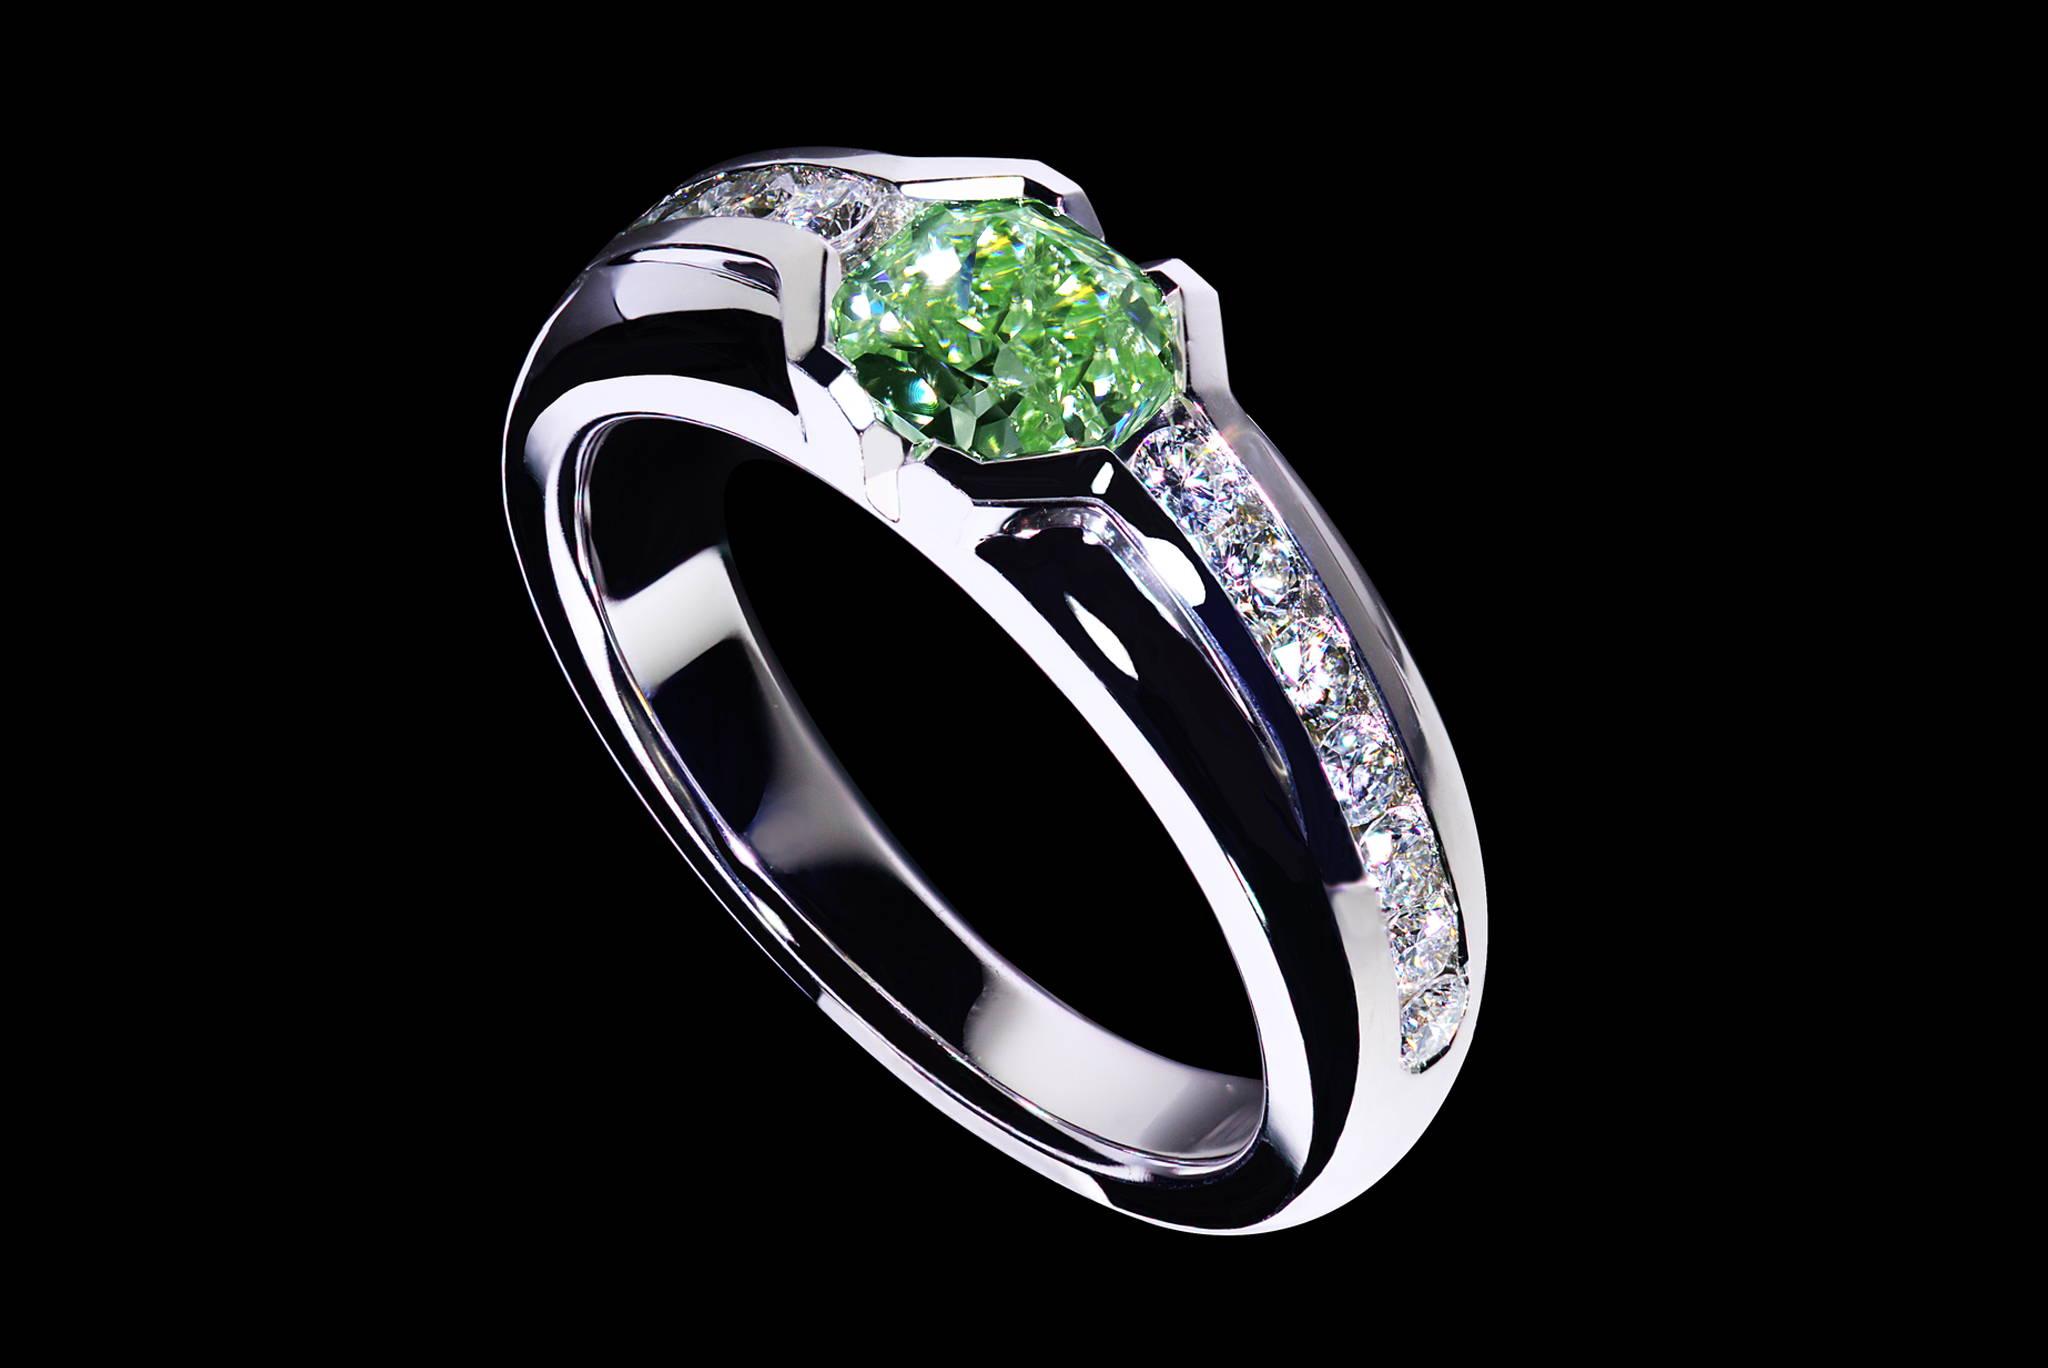 Rare Investment Grade Vivid Green Diamond Ring